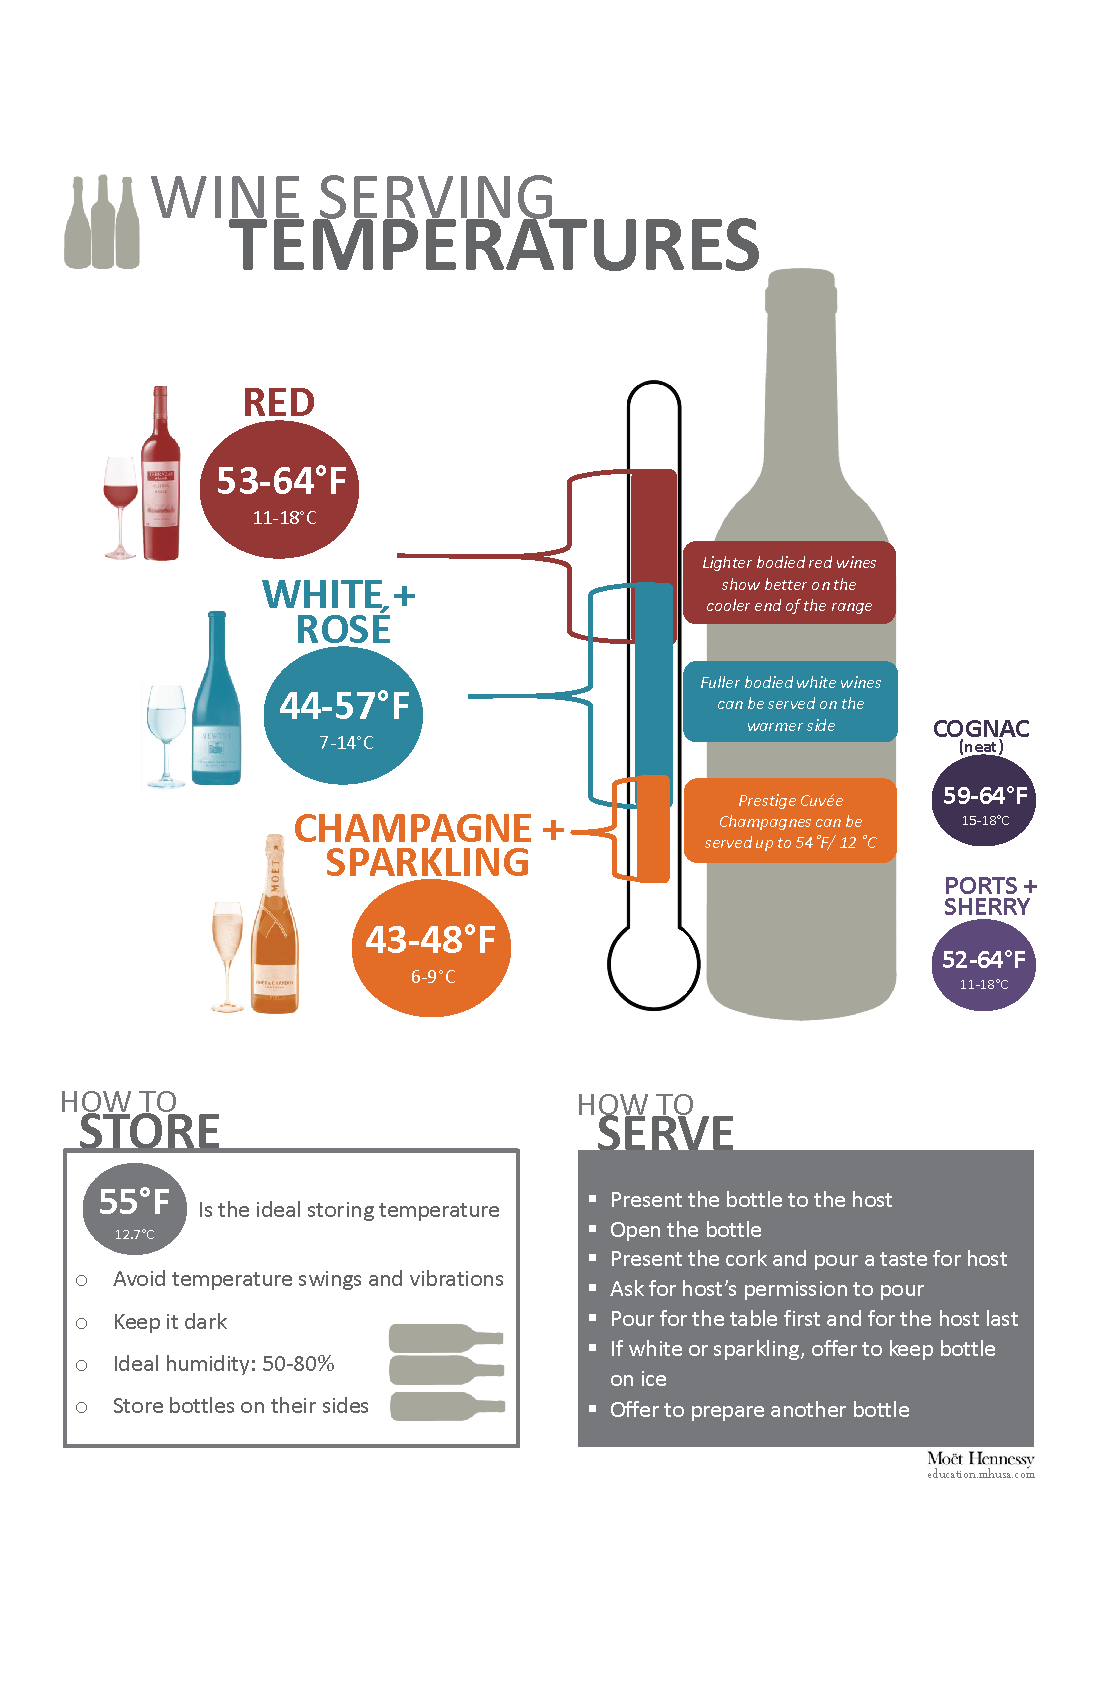 Blackstone Catering Veuve Wine Serving Dinner